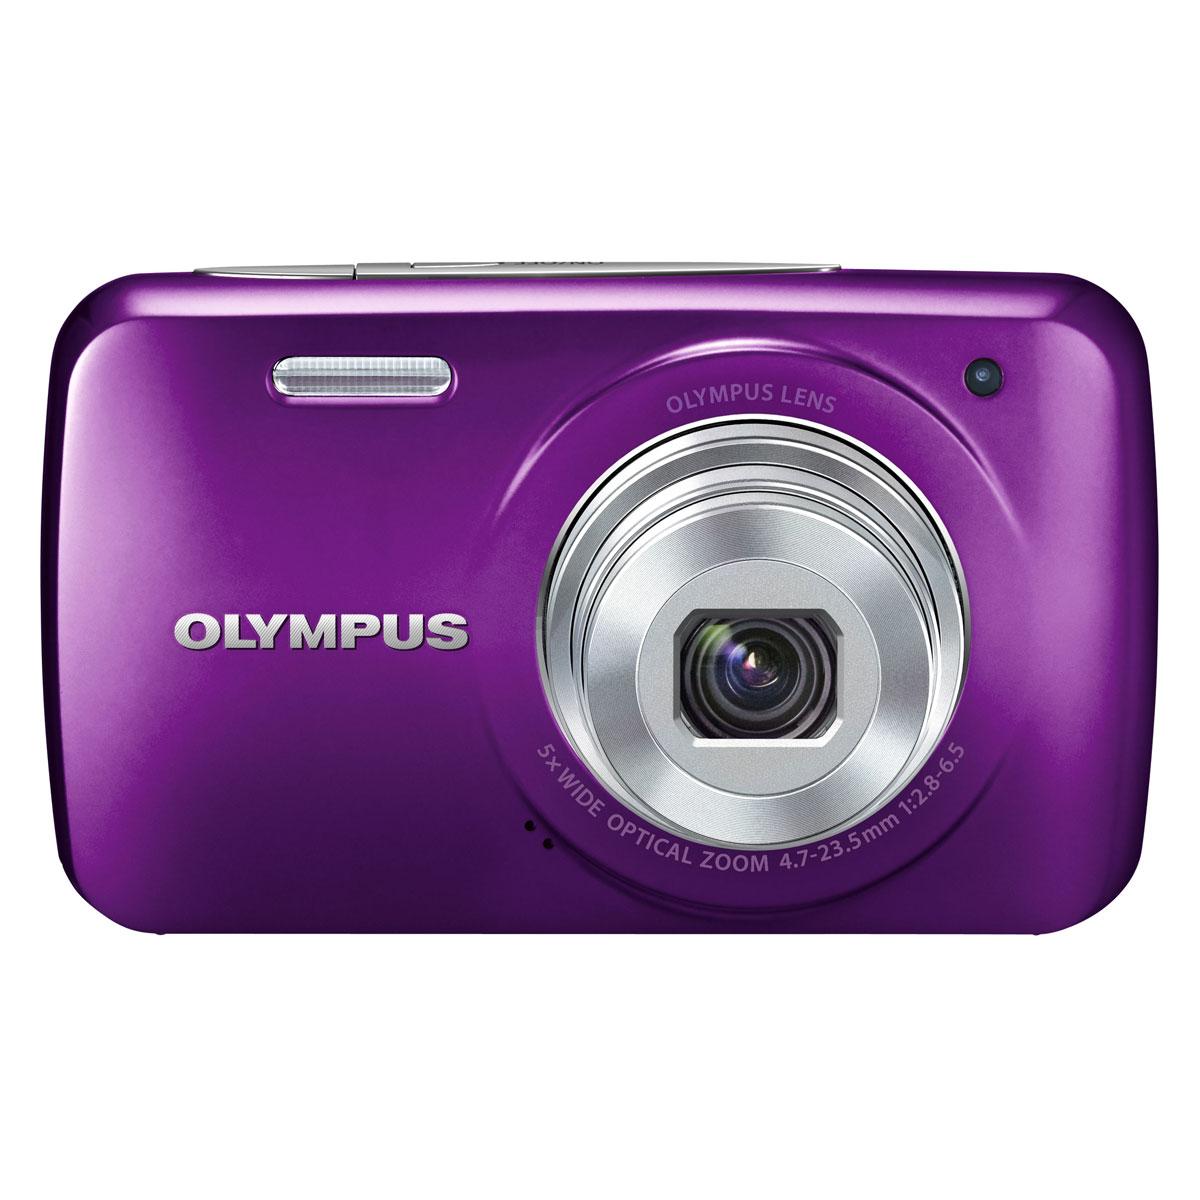 olympus vh 210 violet appareil photo num rique olympus sur ldlc. Black Bedroom Furniture Sets. Home Design Ideas